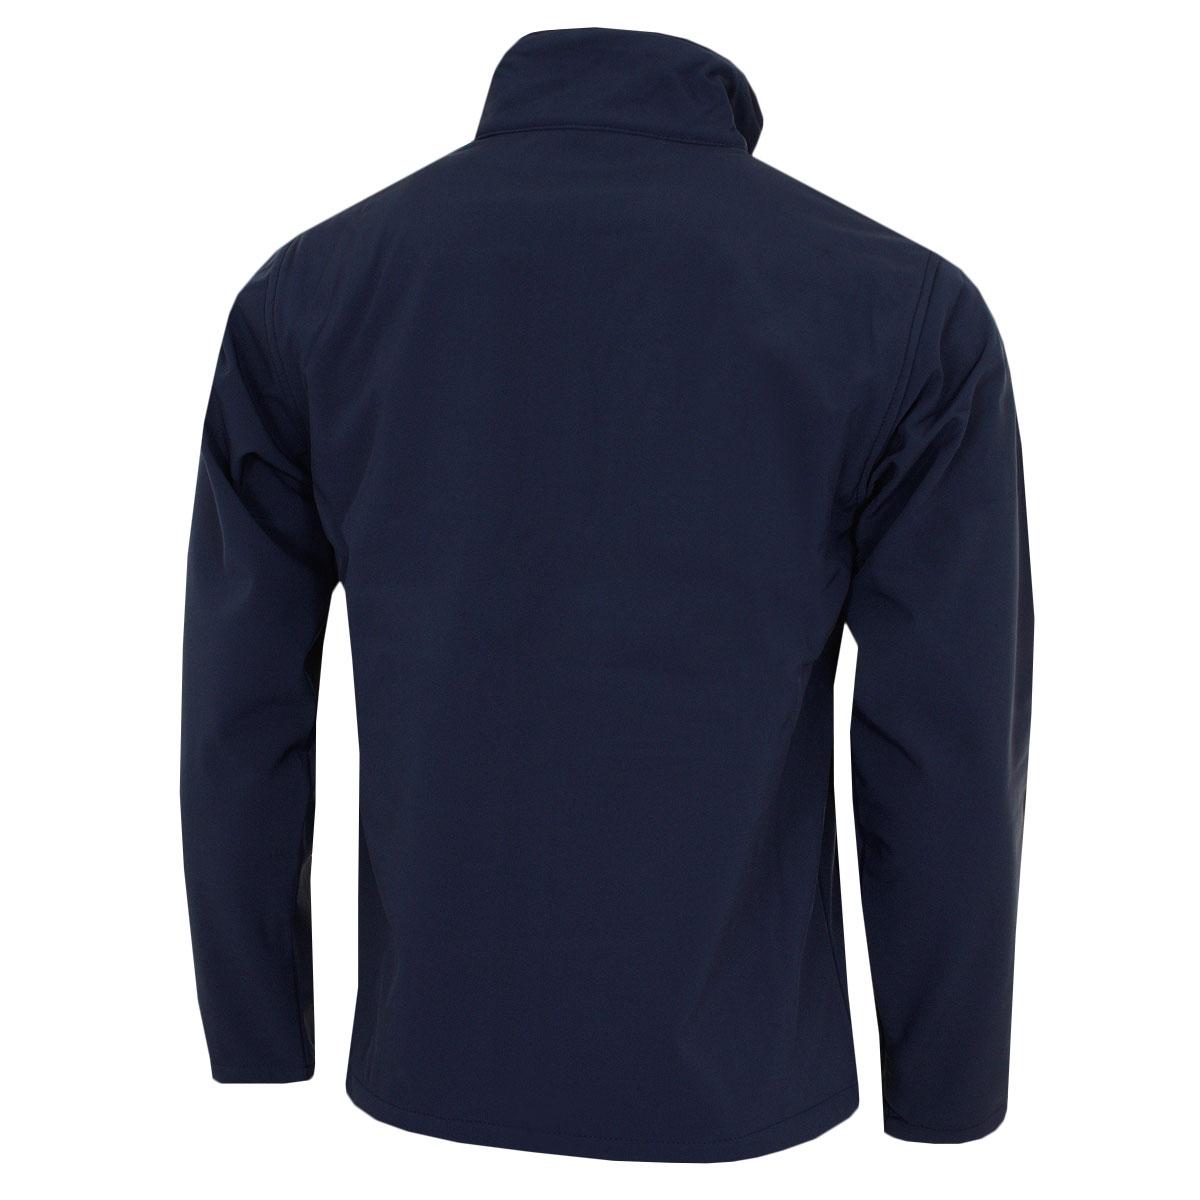 Regatta-Mens-Void-Softshell-Water-Repellent-Windproof-Jacket-60-OFF-RRP thumbnail 7